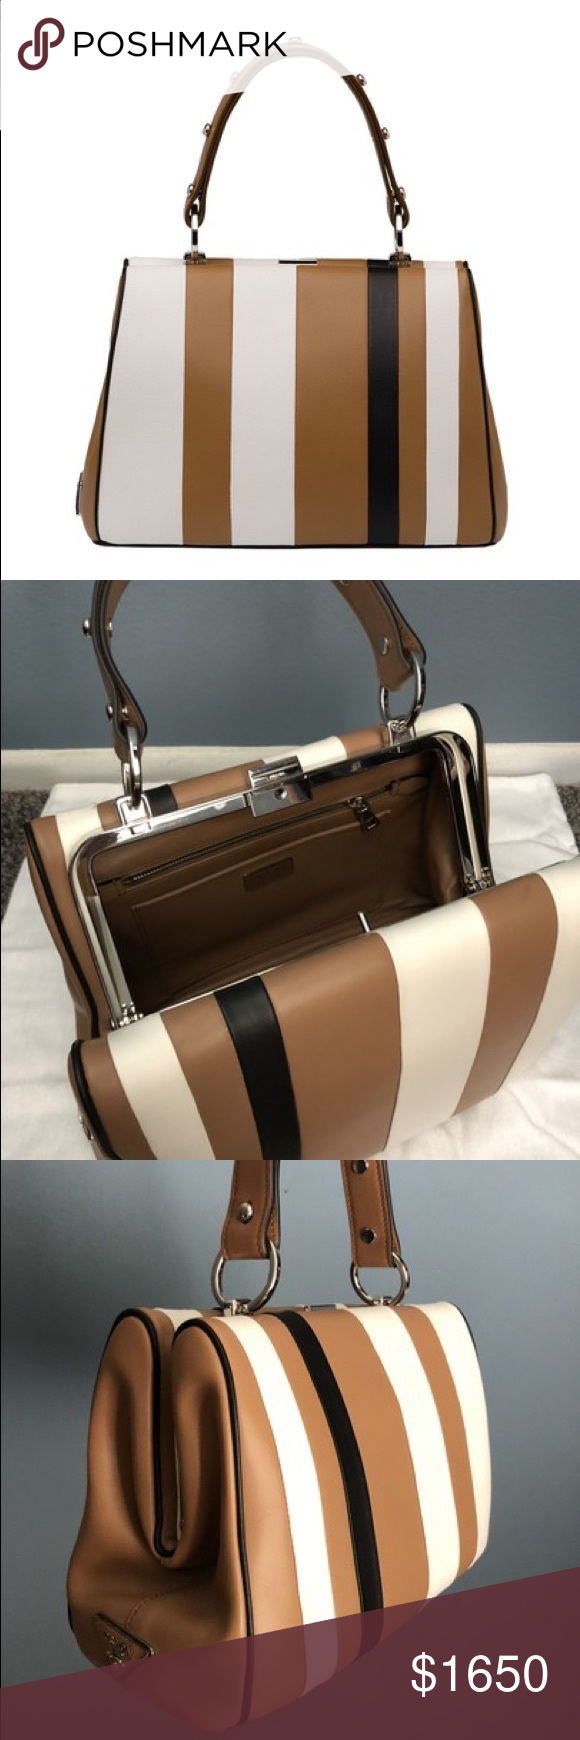 9ecae20a64acd9 Prada Baiadera Arcade-Stripe Frame Satchel Bag Prada Arcade Stripe Frame in  Camel/White/Black (Caramel+bianco+nero) Calfskin Leather S…   My Posh Picks  in ...